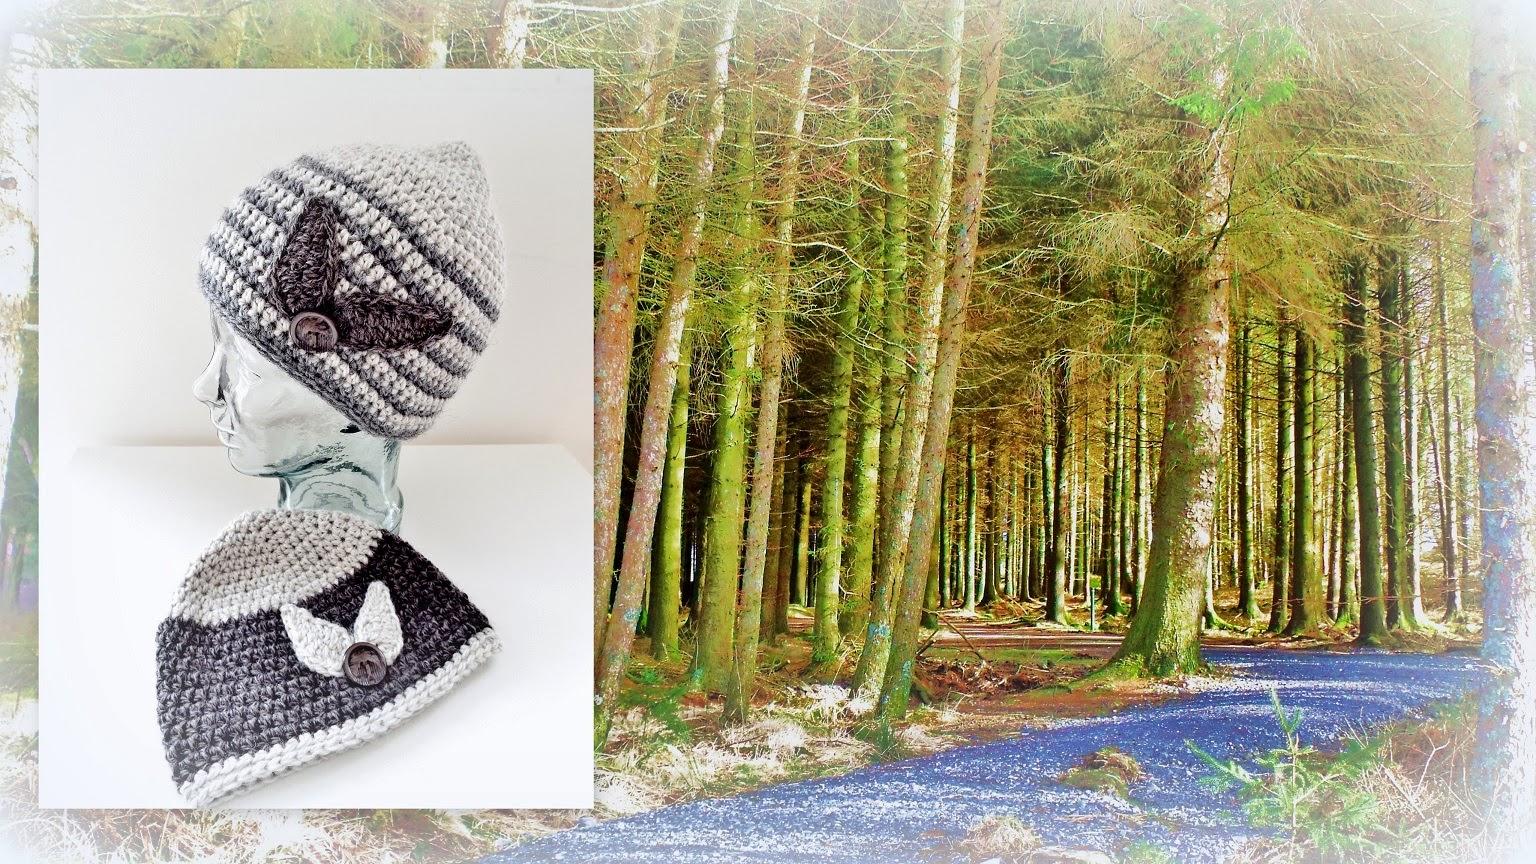 crochet patterns, hats, beanies, unisex, man hats,